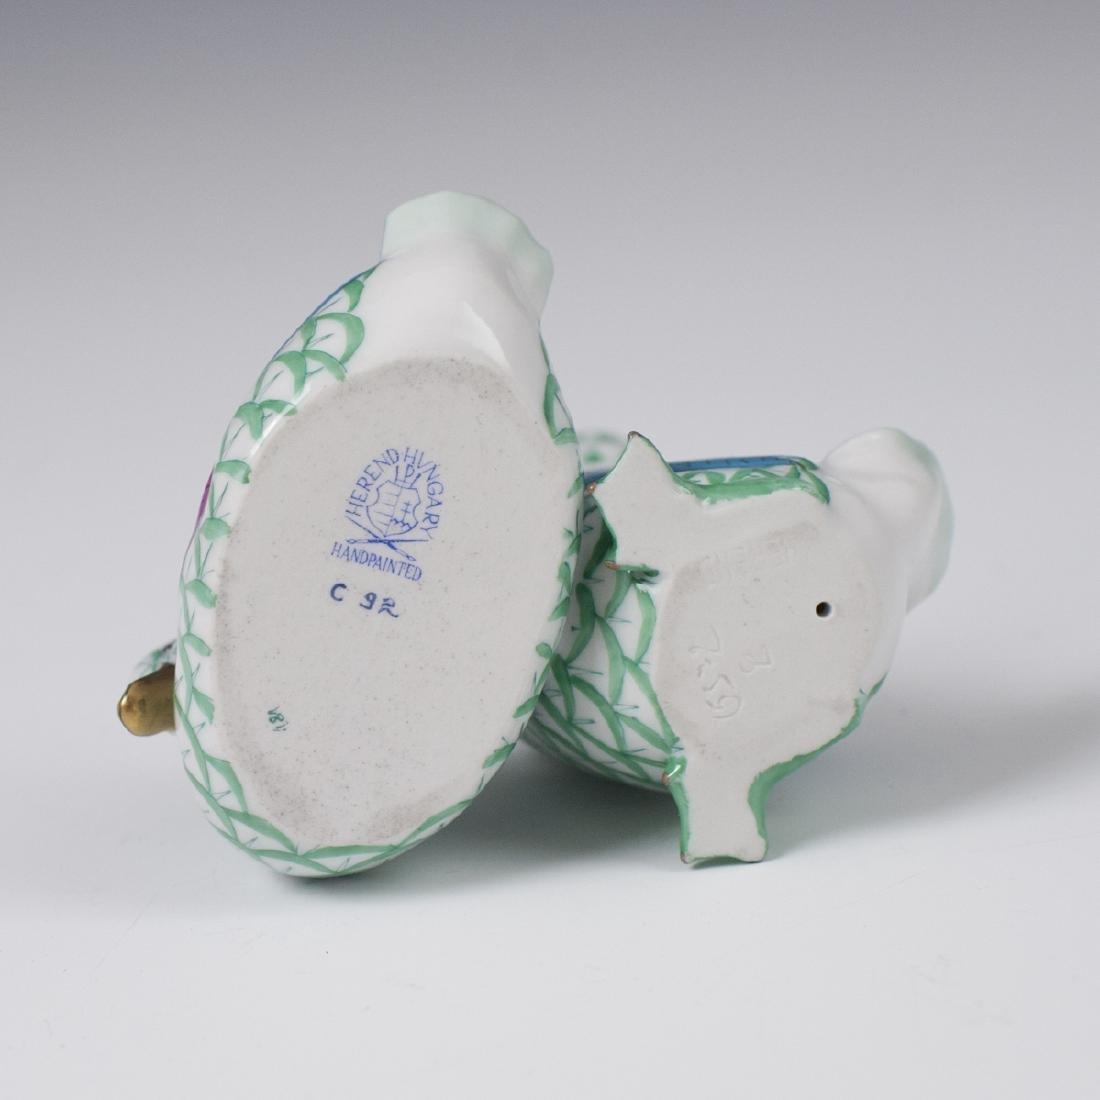 Herend Porcelain Pair of Ducks Fishnet Figurine - 3